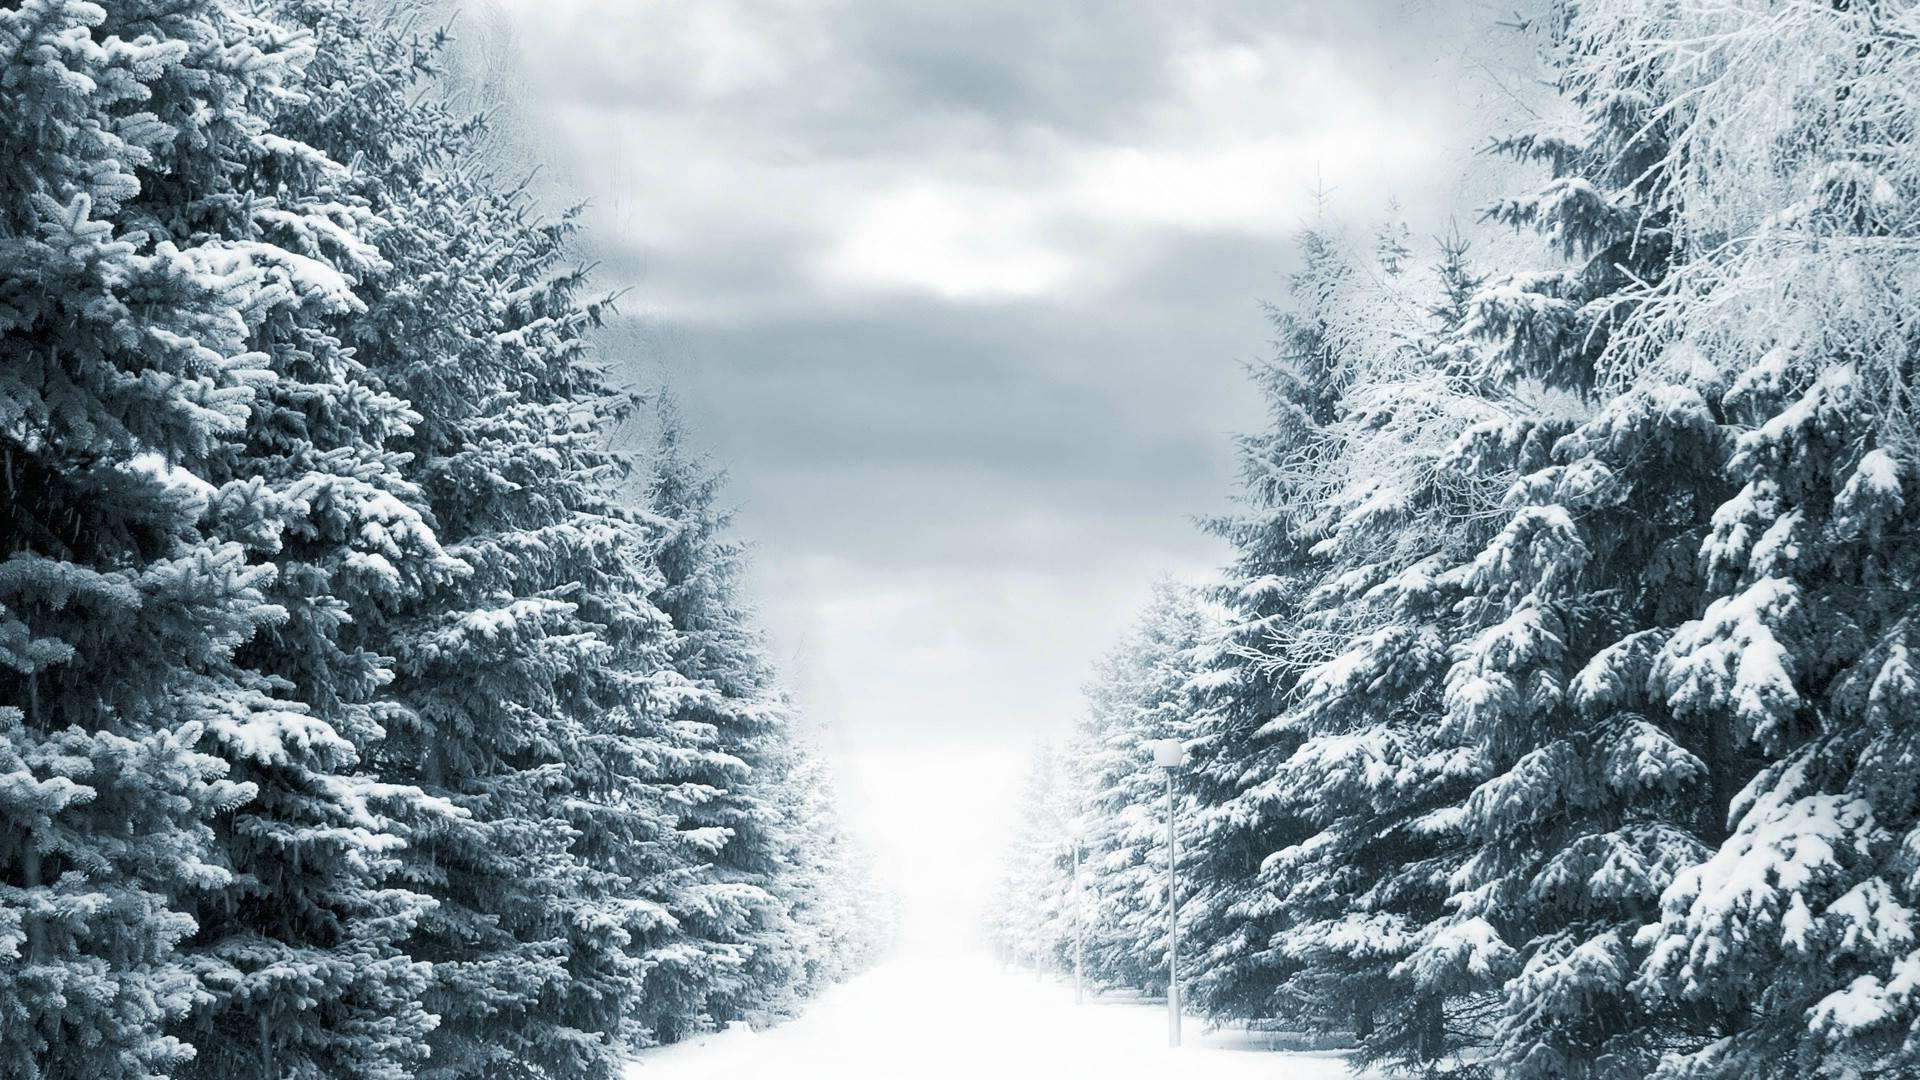 Storm City Wallpaper Hd 3d Snowy Backgrounds 54 Images